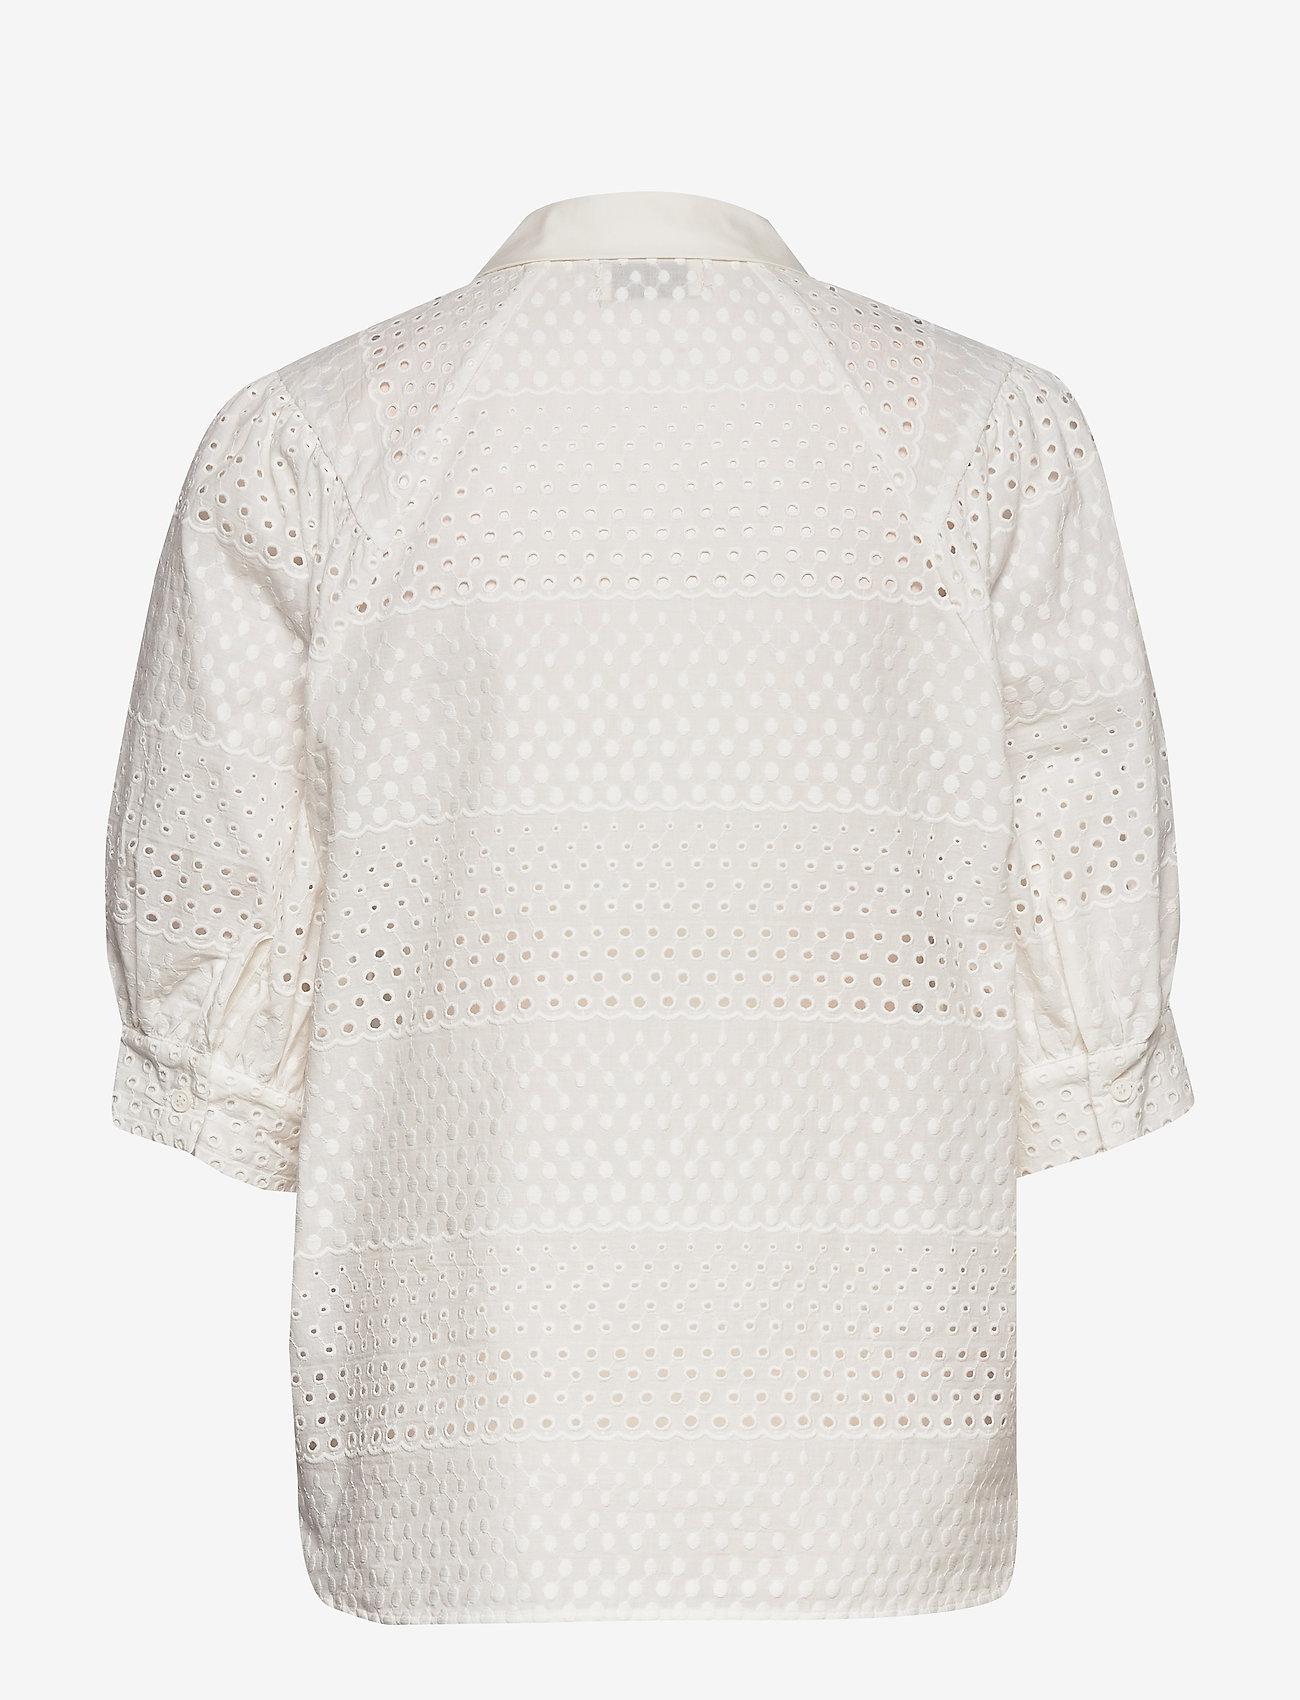 Lr-isalouise (L100 - White) - Levete Room nQhuoi